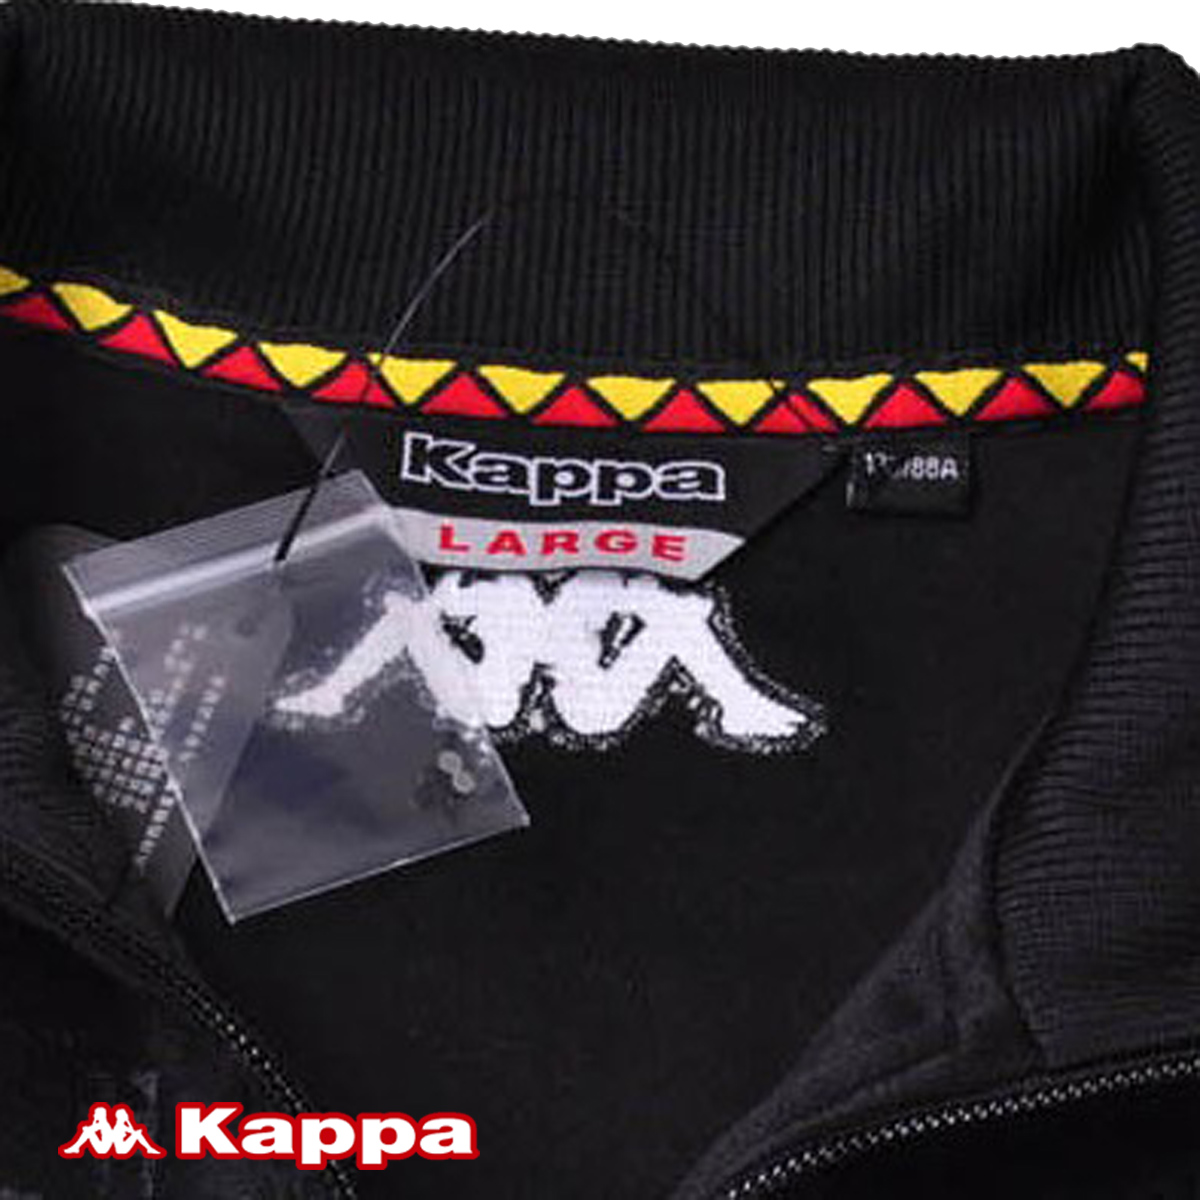 Спортивная толстовка Kappa k2101wk016/990 .. K2101WK016-990 Женские Кардиган Спорт на открытом воздухе Весна 2010